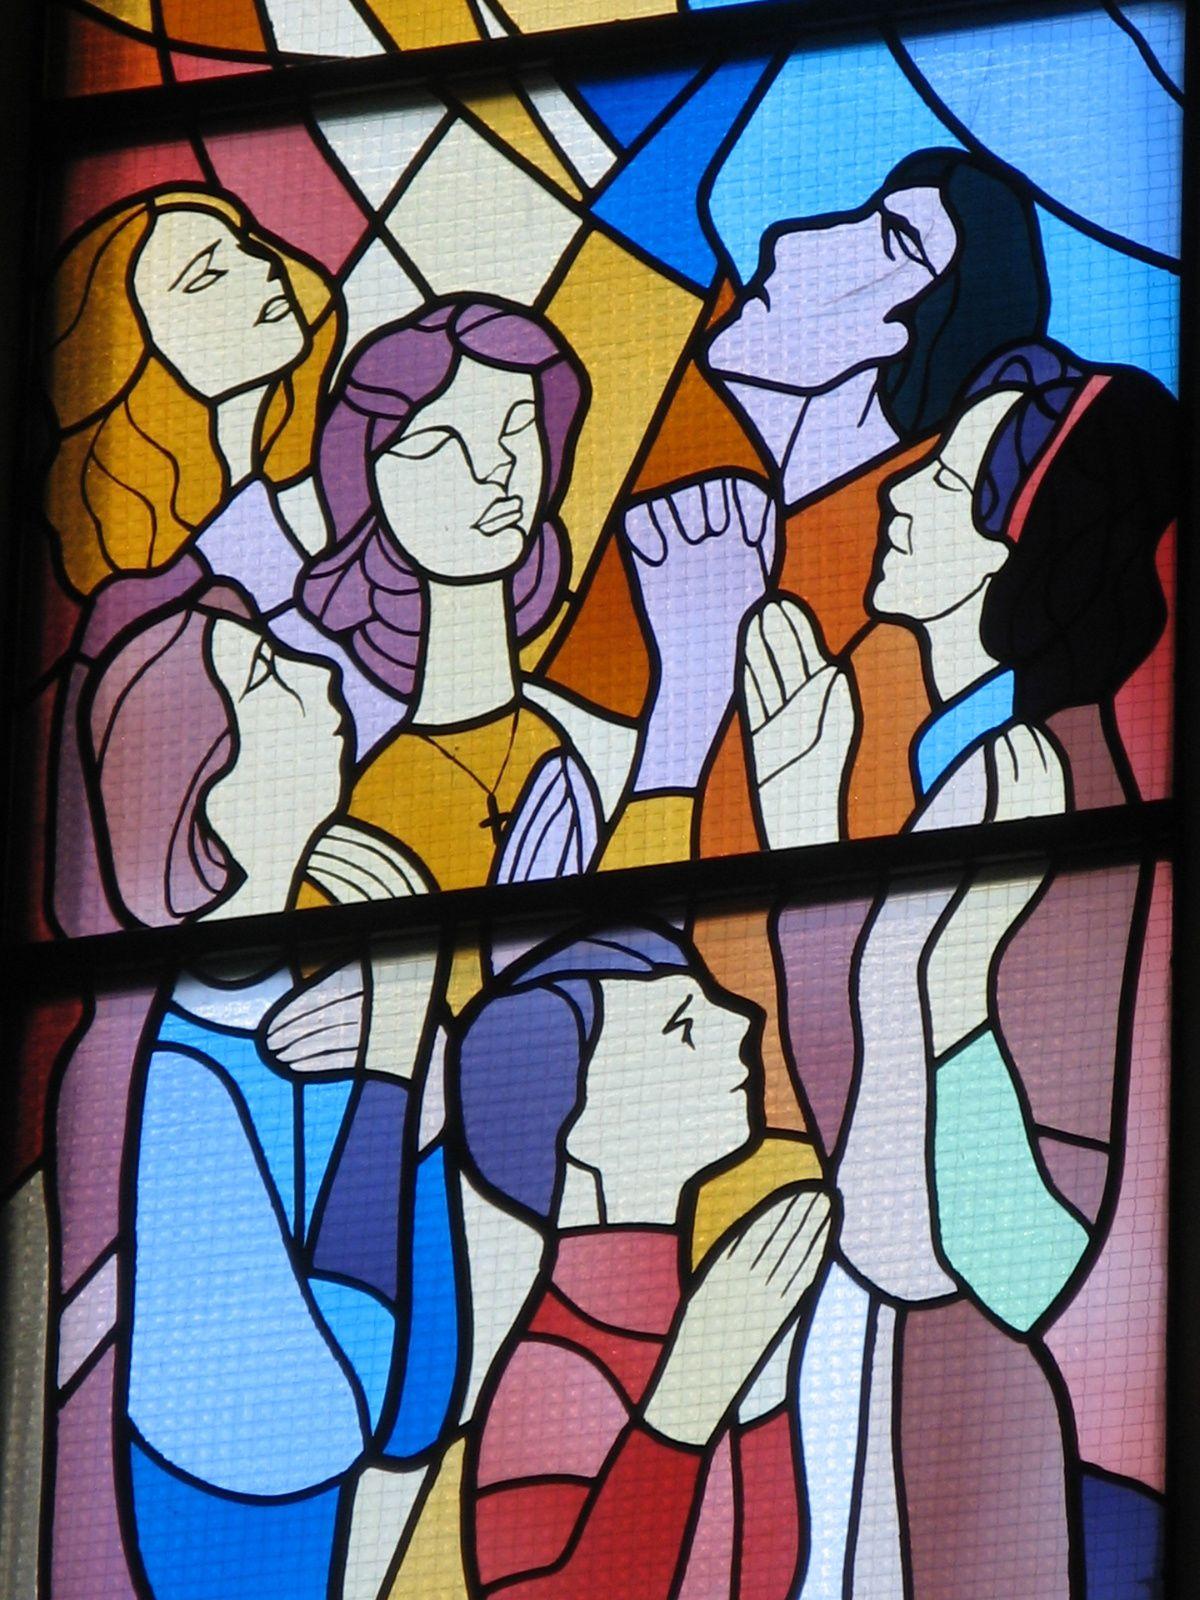 Message du 2 avril, (jeudi Saint) de la Gospa (Vierge) à Medjugorje